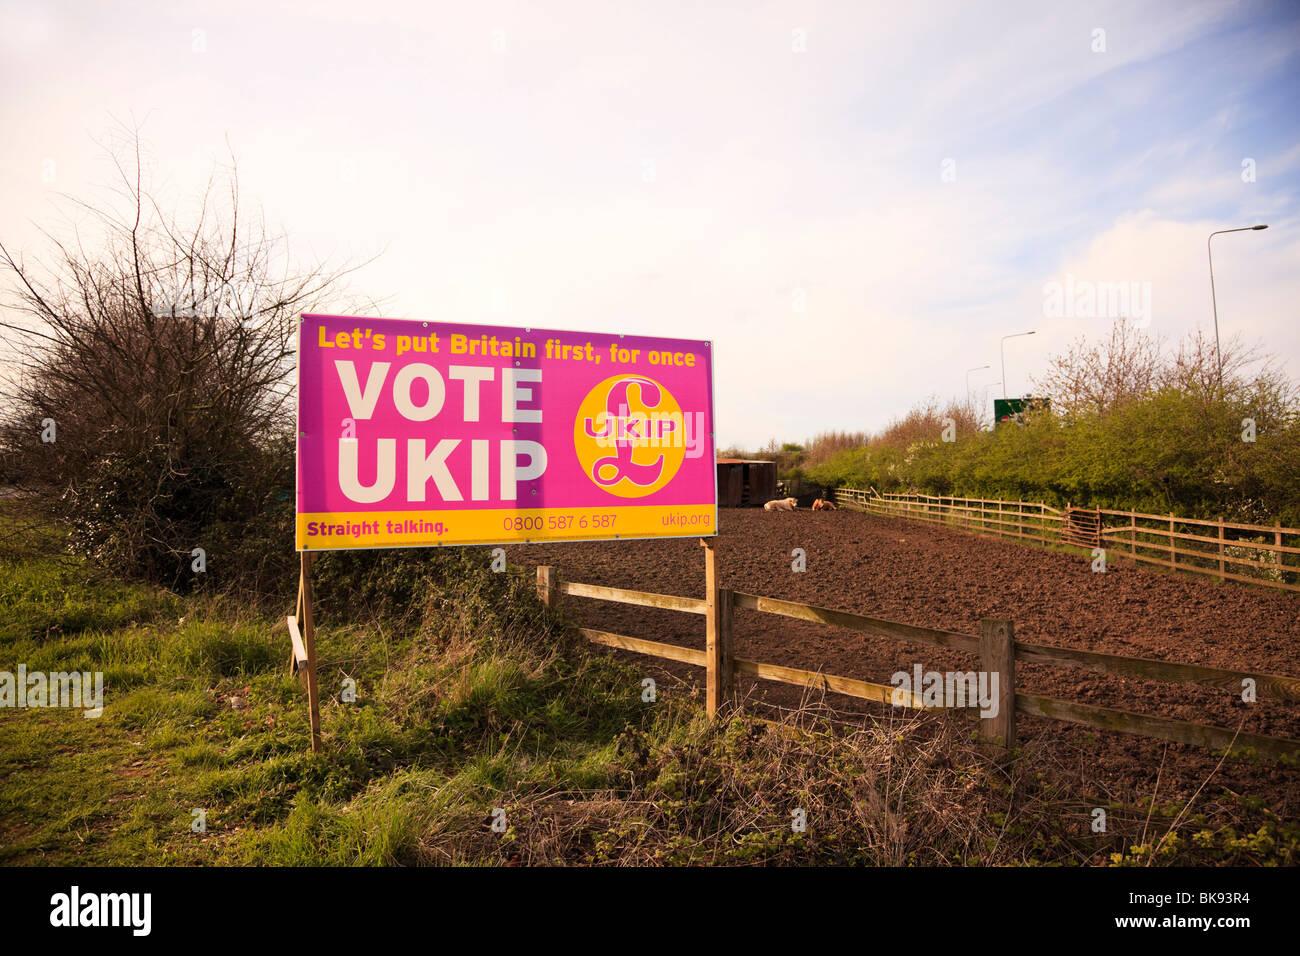 UK Independance Party election billboard. - Stock Image